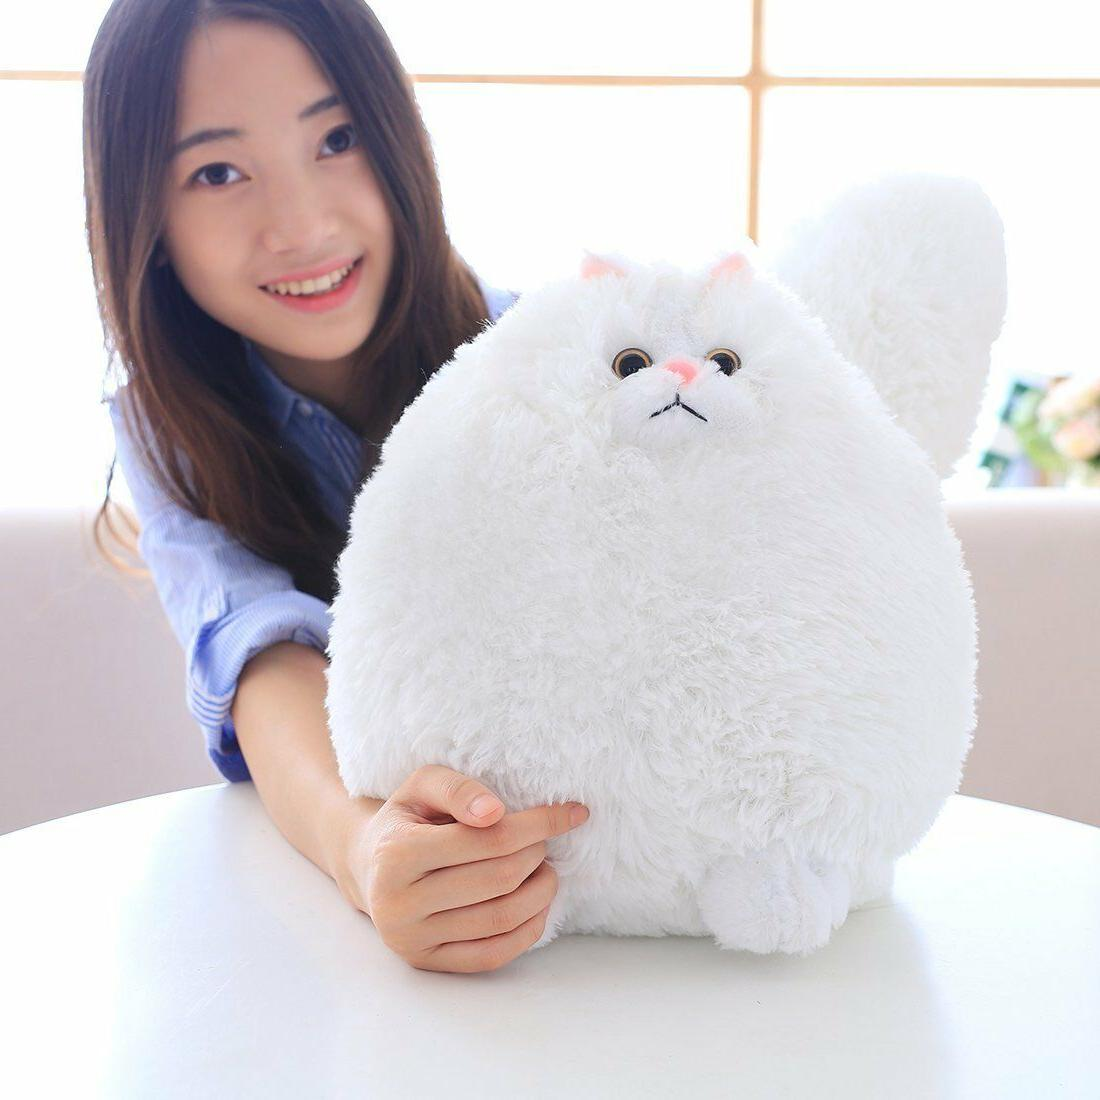 Winsterch Stuffed Animal Doll,White Cat Plush,11.8''